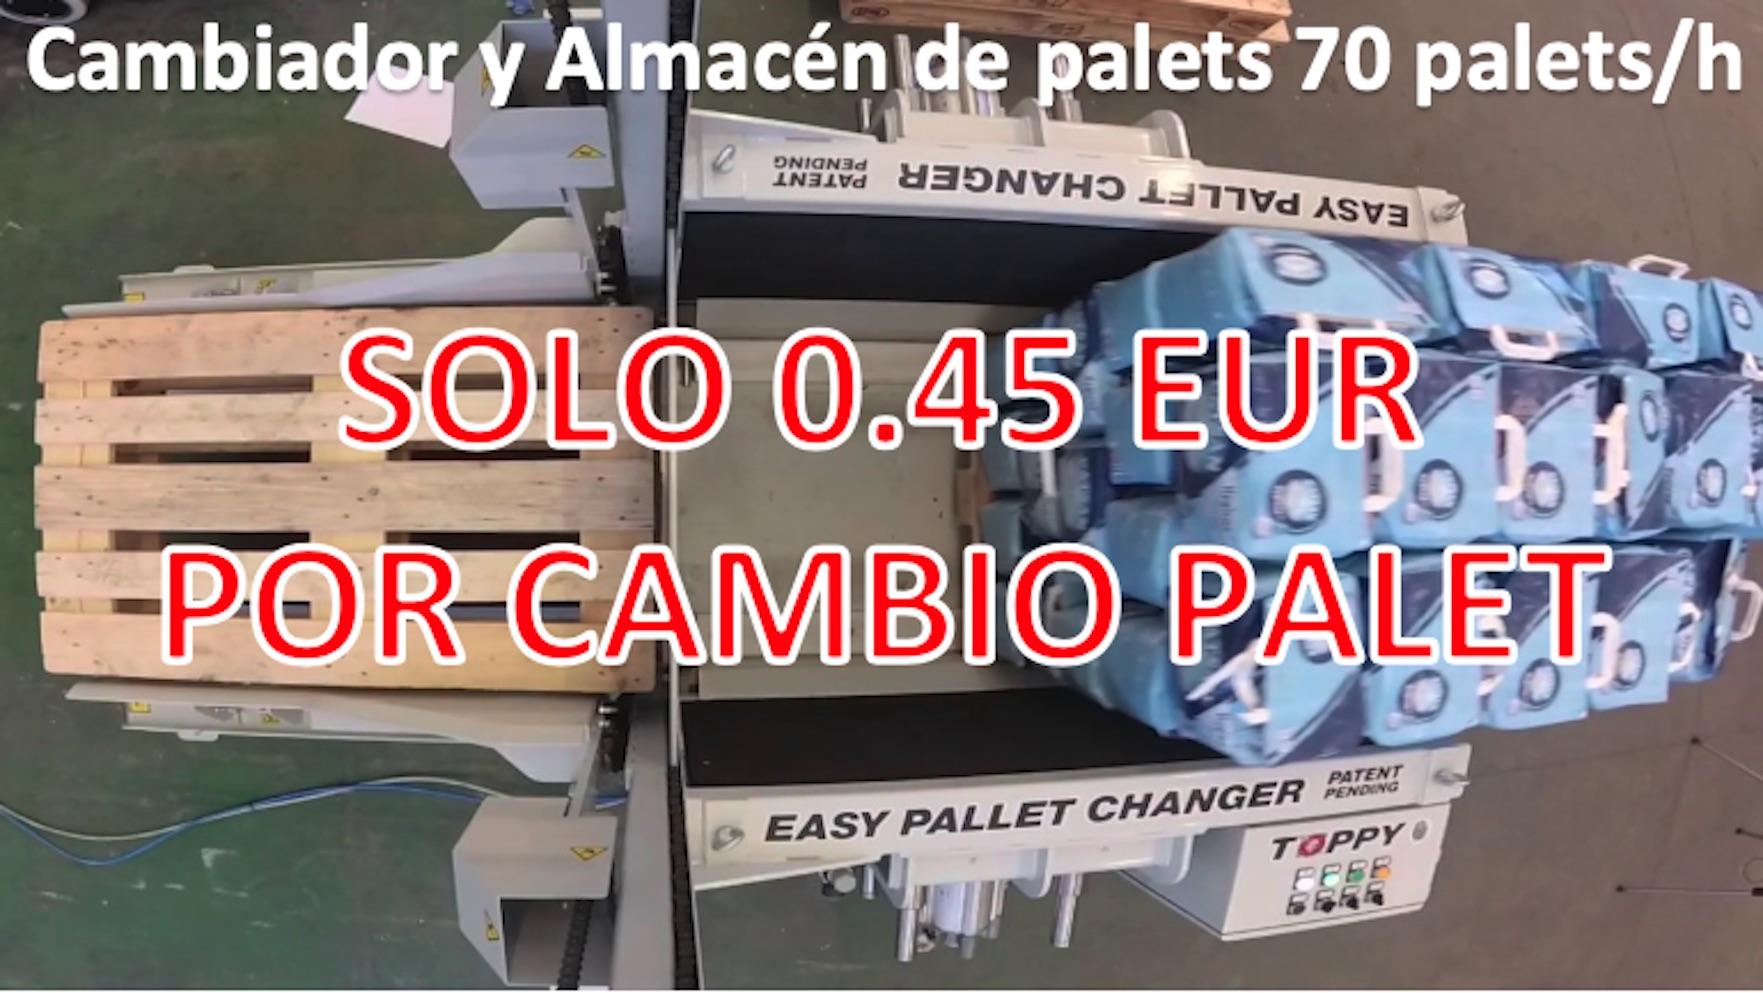 Solo 0.45 EUR por cambio palet